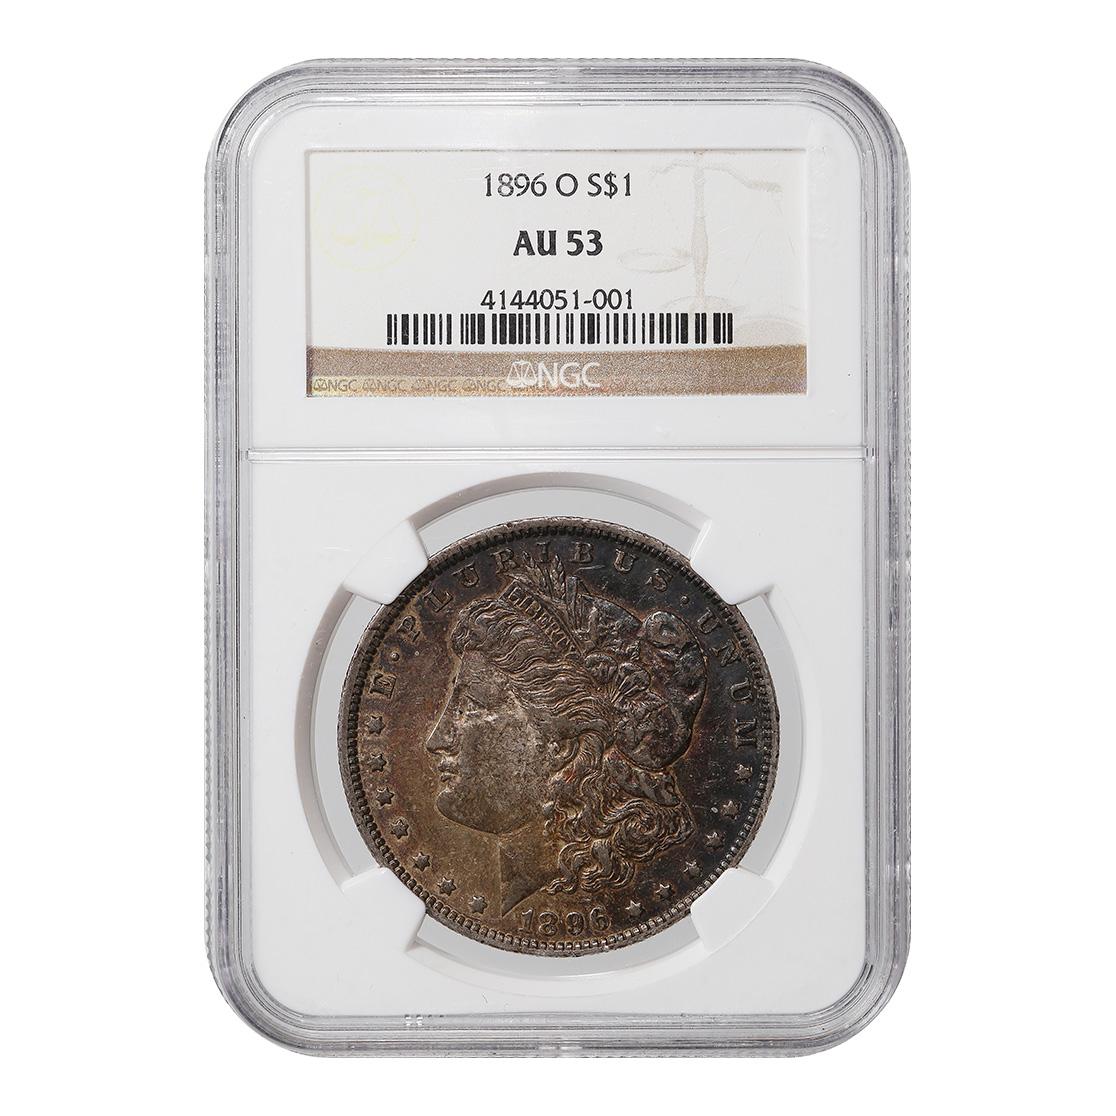 Certified Morgan Silver Dollar 1896-O AU53 NGC